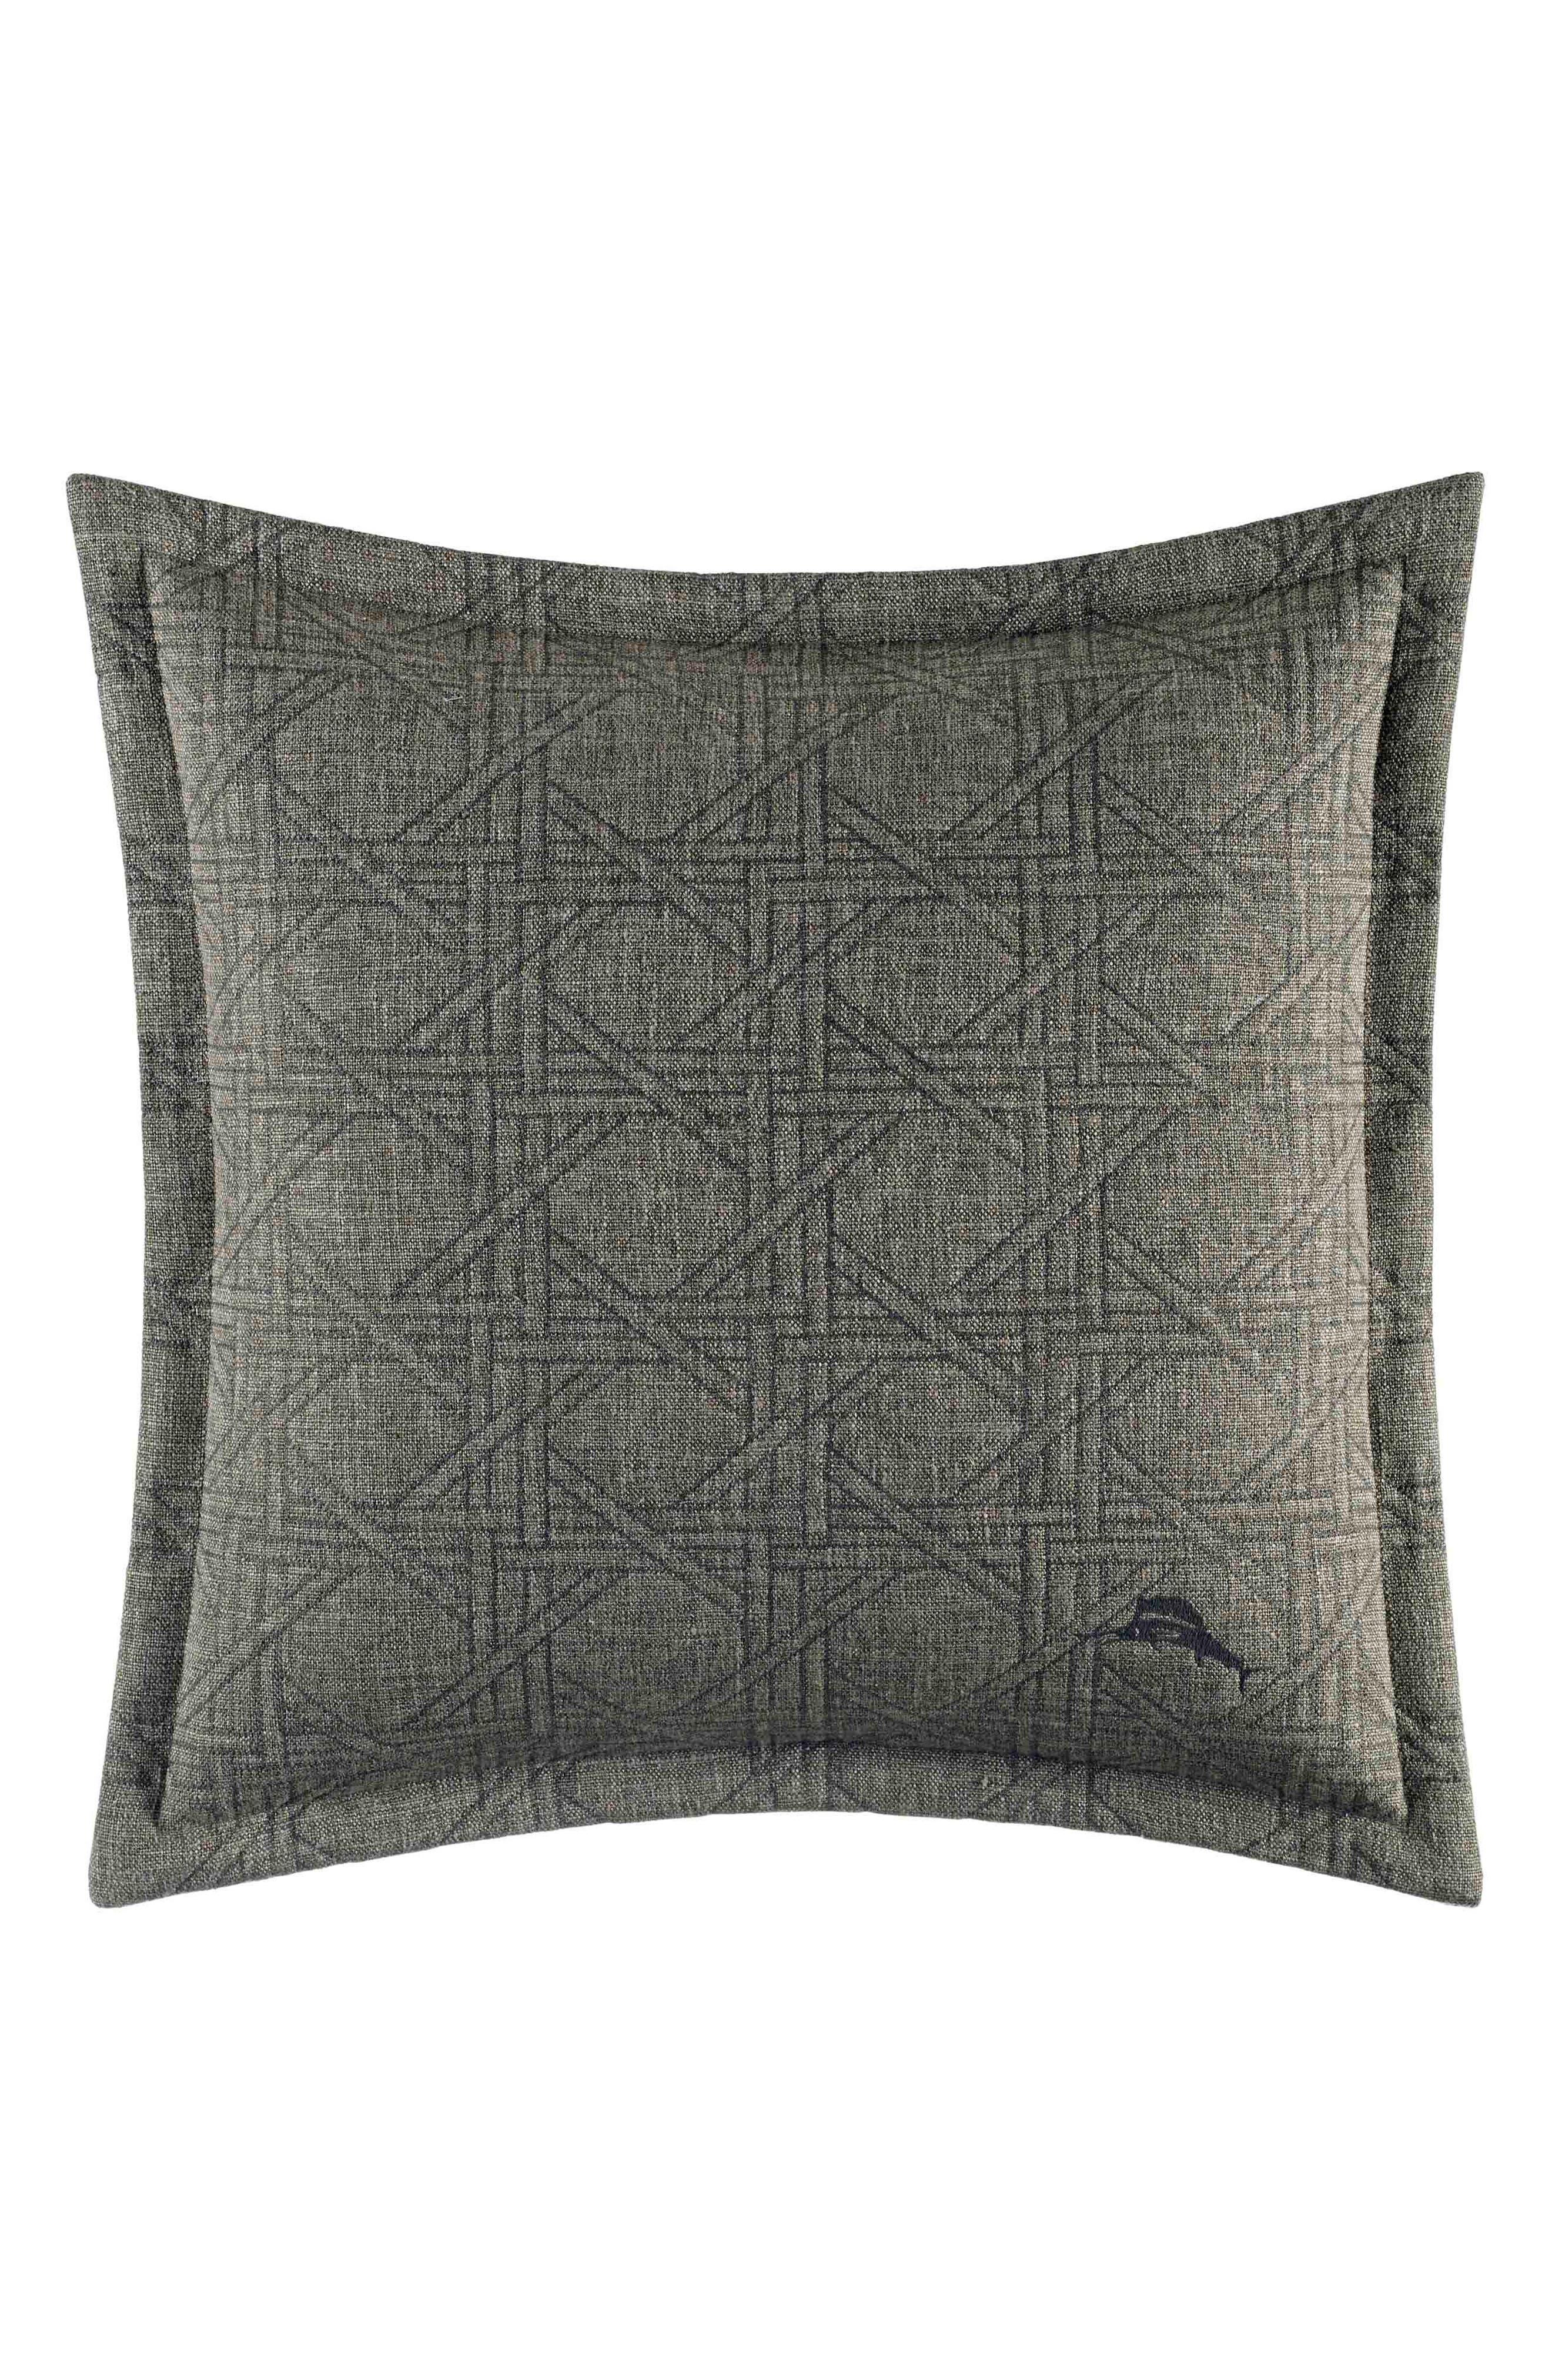 Palms Away Accent Pillow,                             Main thumbnail 1, color,                             Dark Green